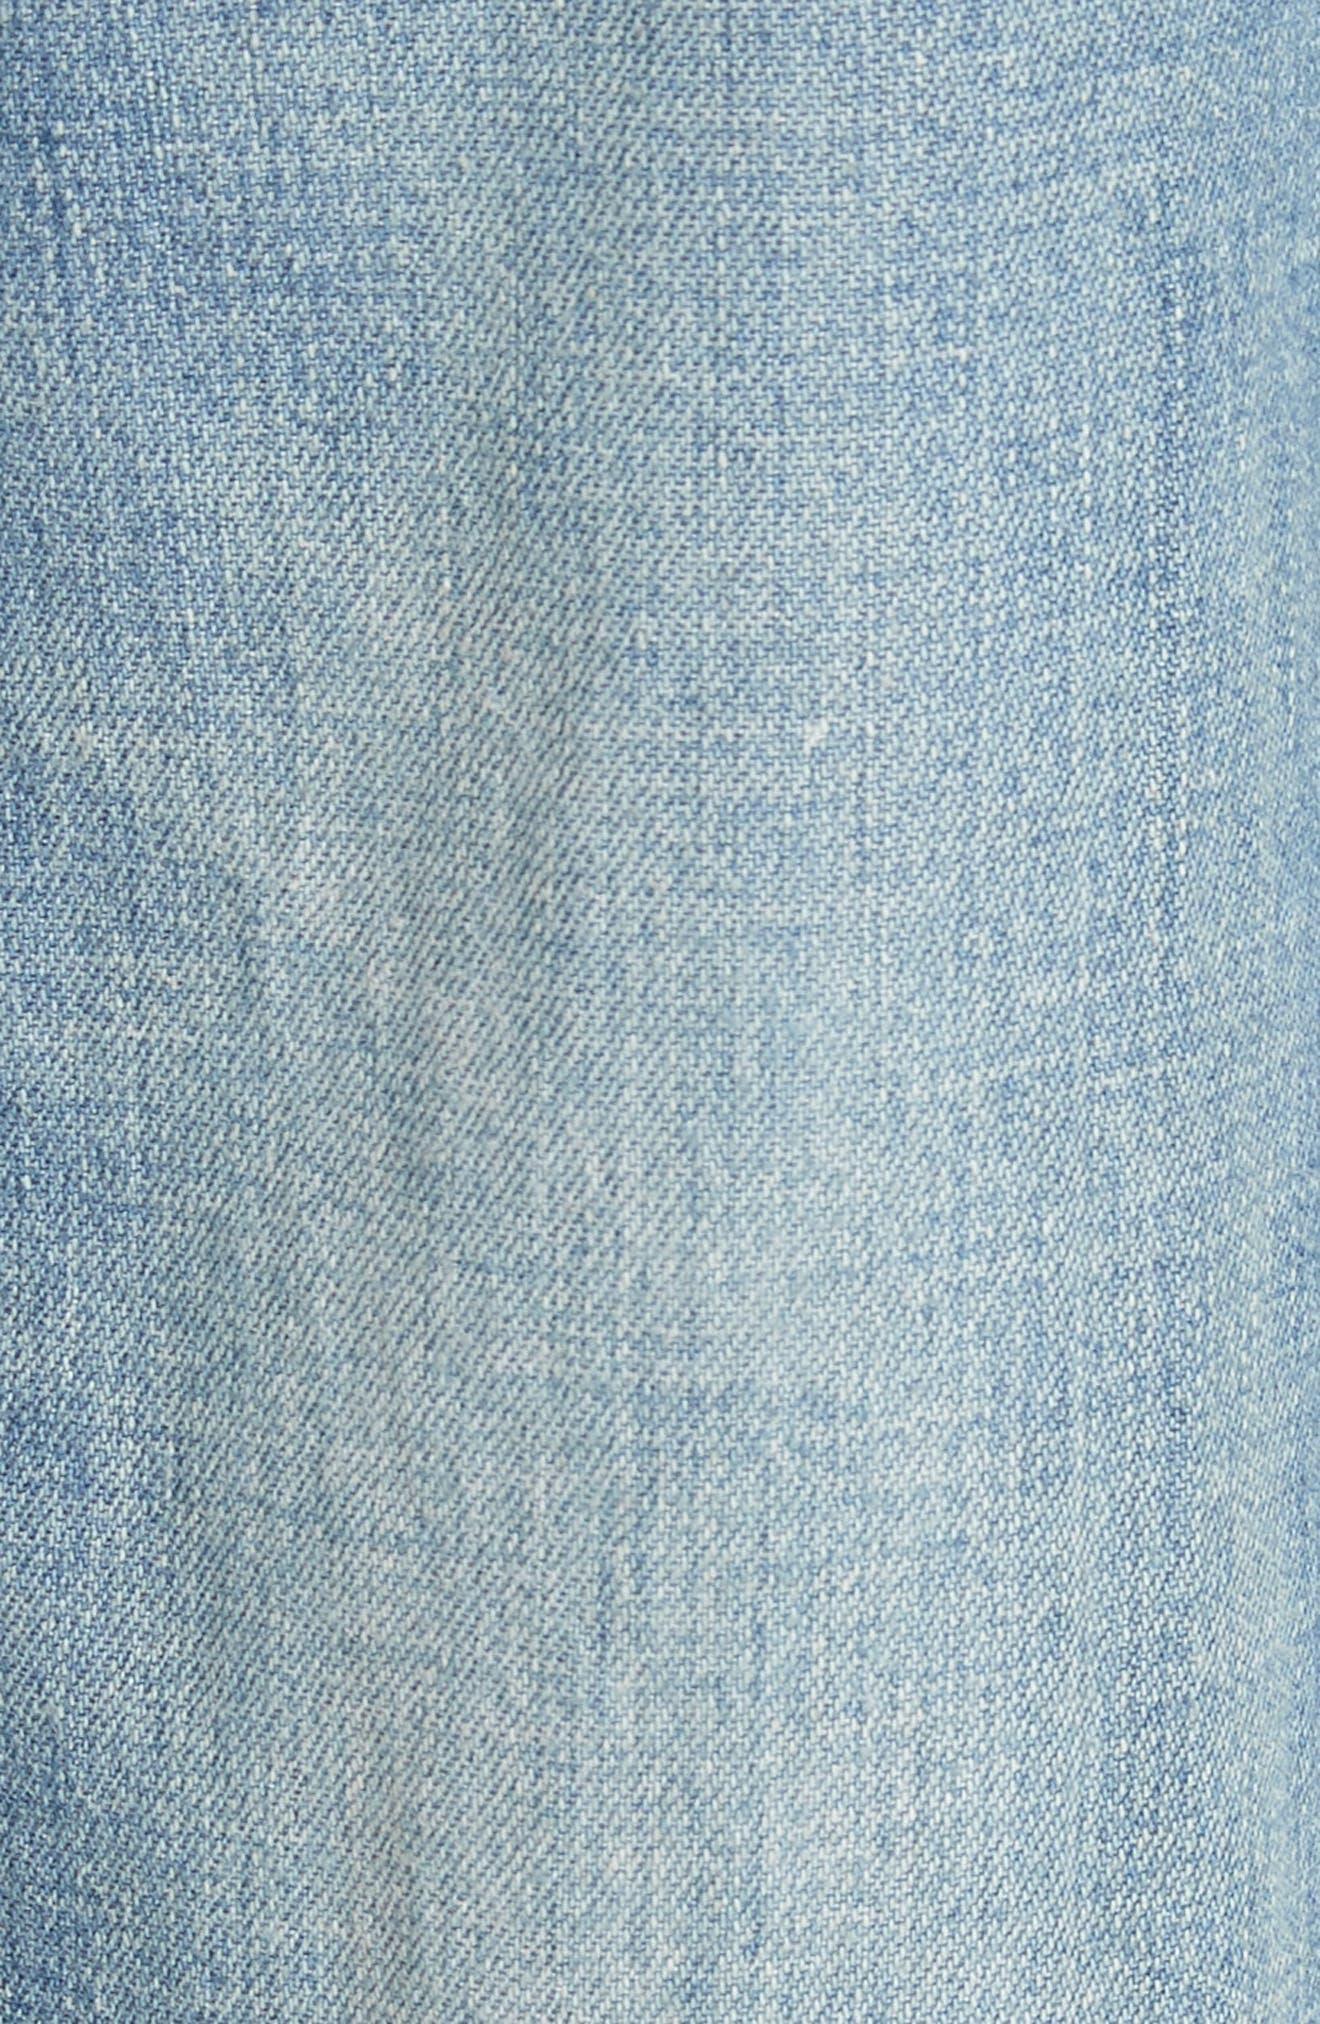 Drapey Denim Wide Leg Pants,                             Alternate thumbnail 5, color,                             Riviera Wash